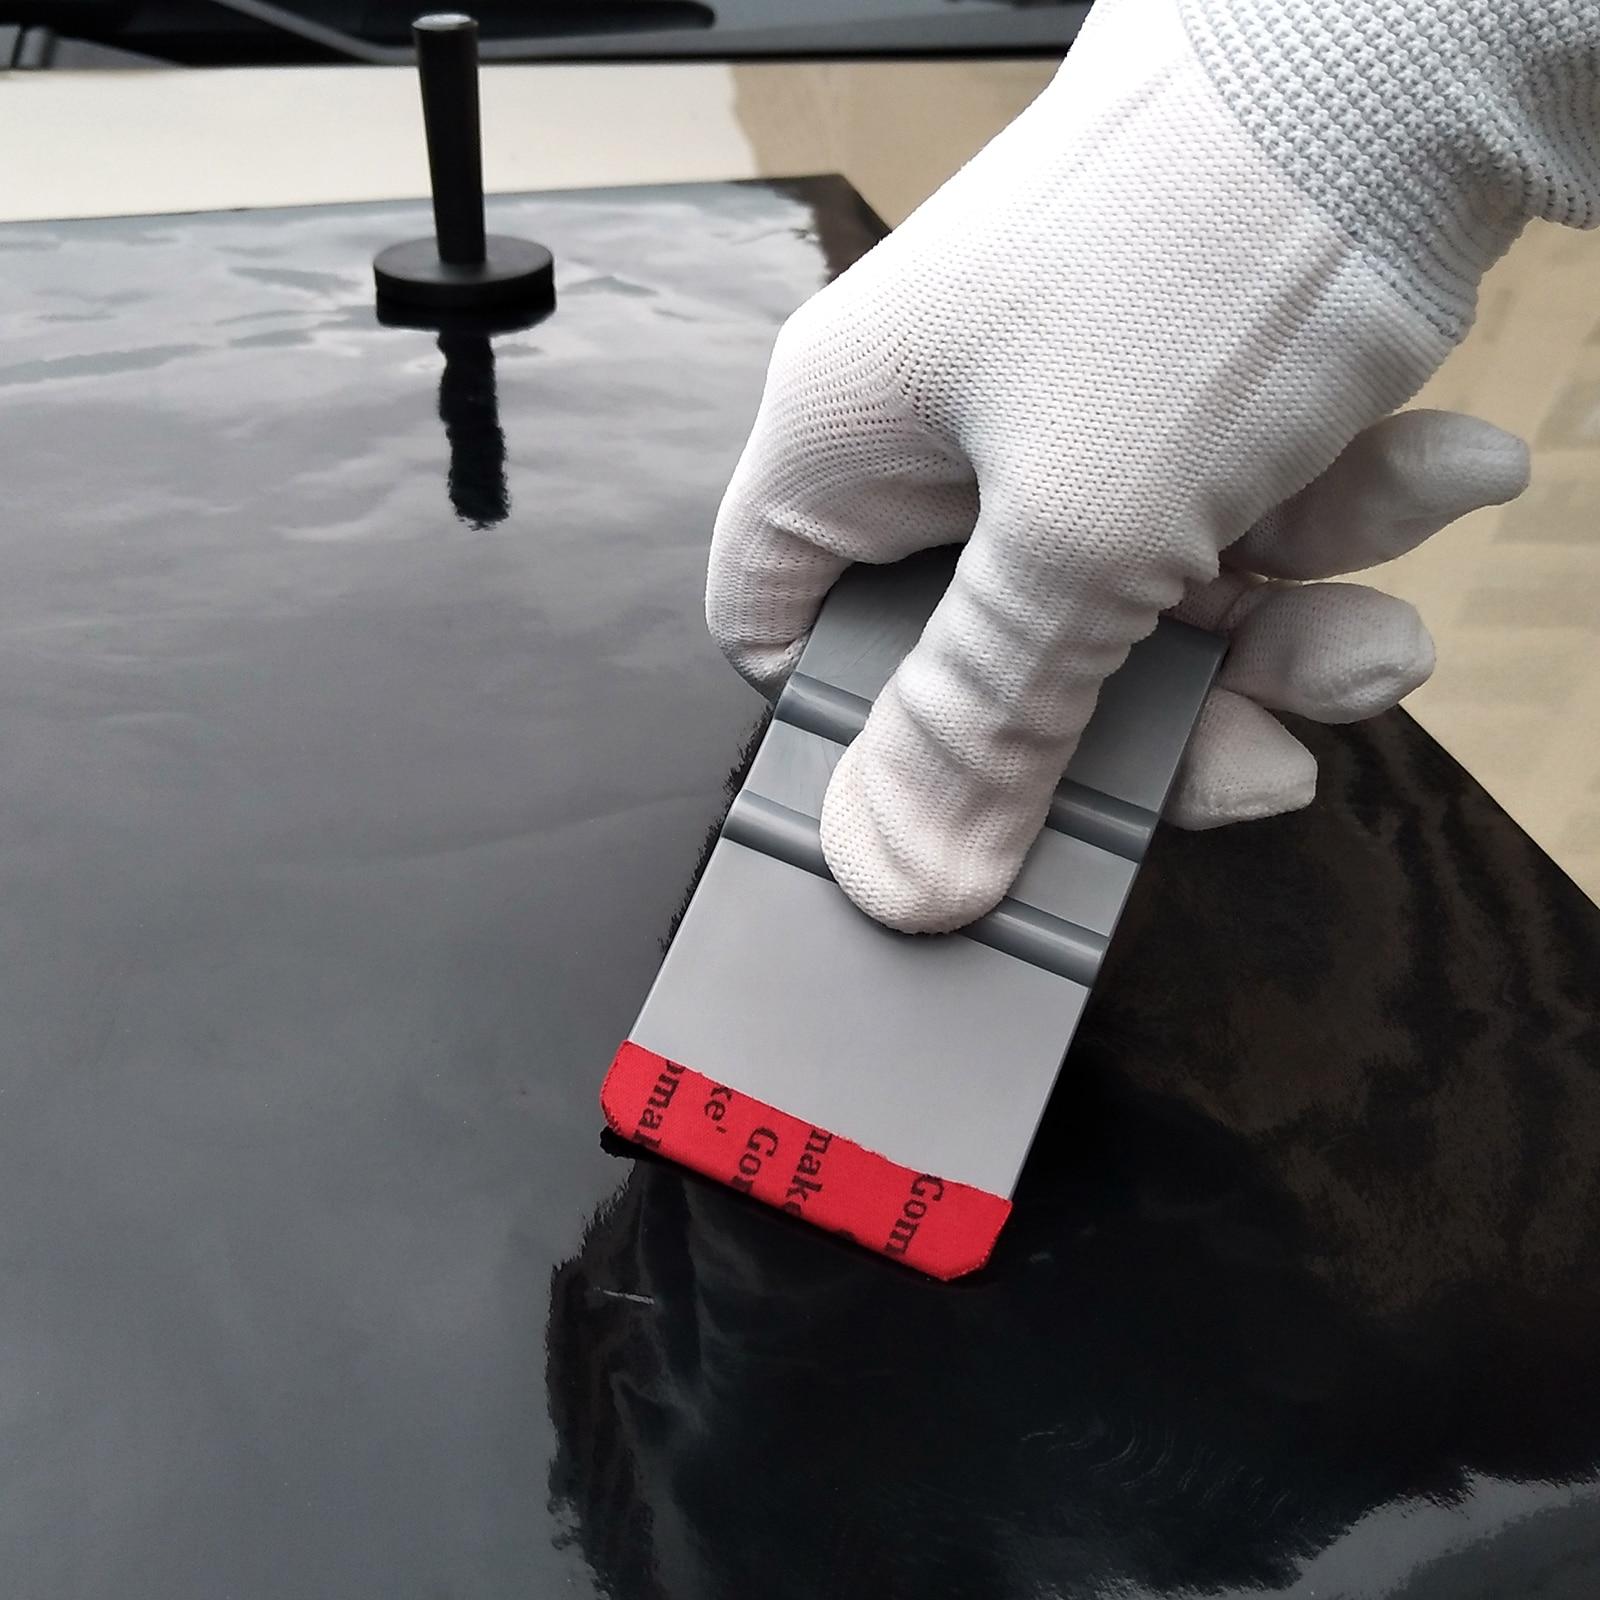 Image 3 - EHDIS Vinyl Wrap Film Pro Tint Microfiber Felt Squeegee Carbon Fiber Suede Scraper Auto Sticker Wrapping Accessories Car Tools-in Scraper from Automobiles & Motorcycles